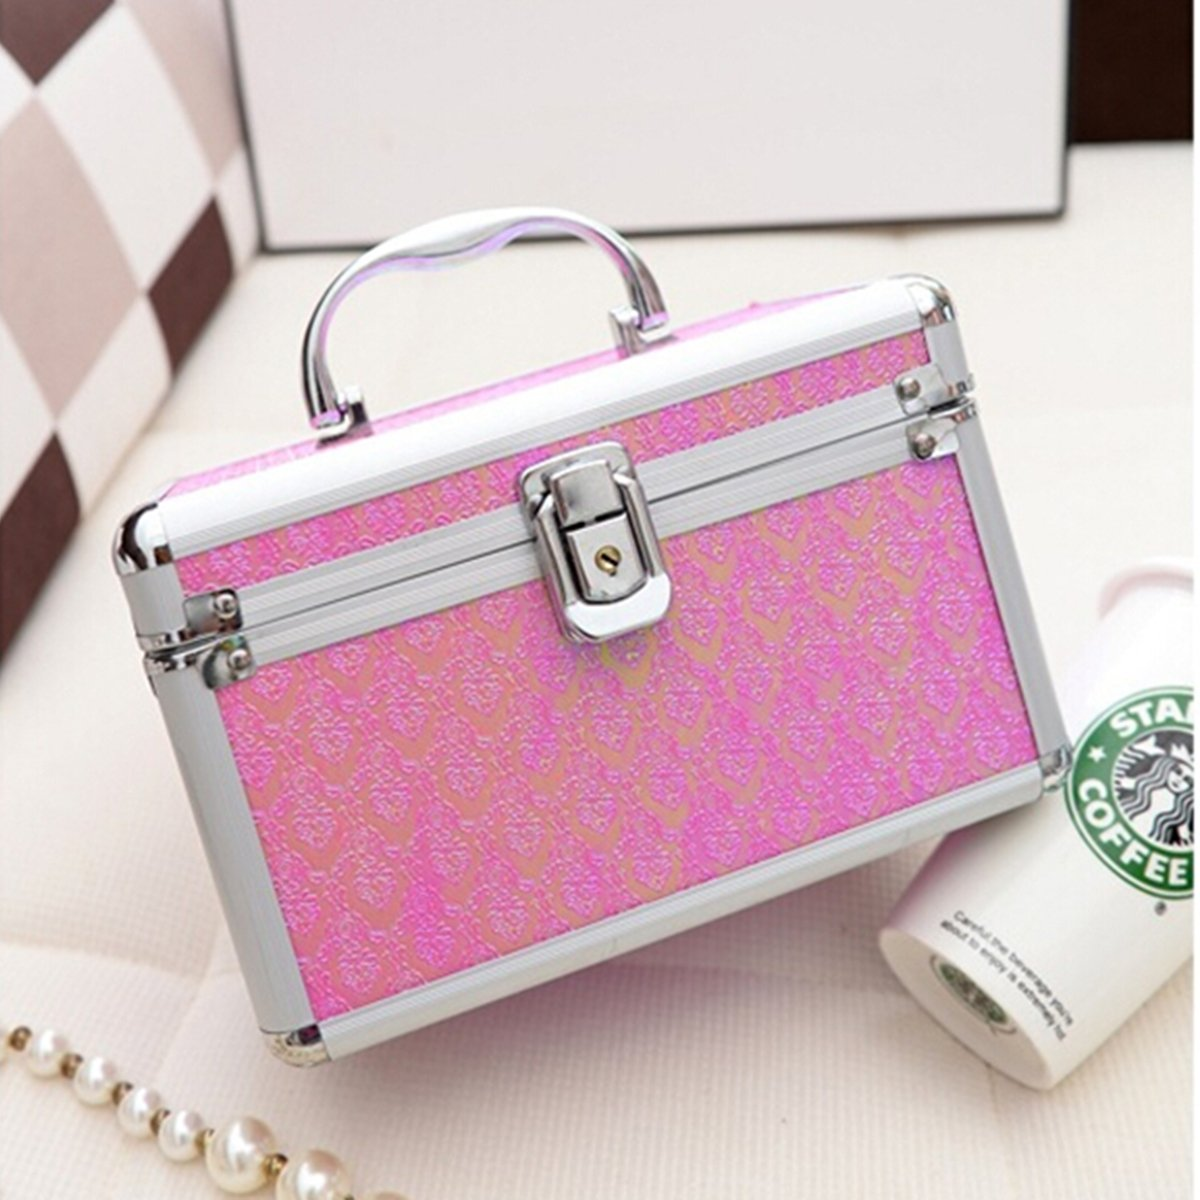 Frcolor Aluminium Make-up Kosmetik Vanity Case Kosmetikbox Organizer Container Silber